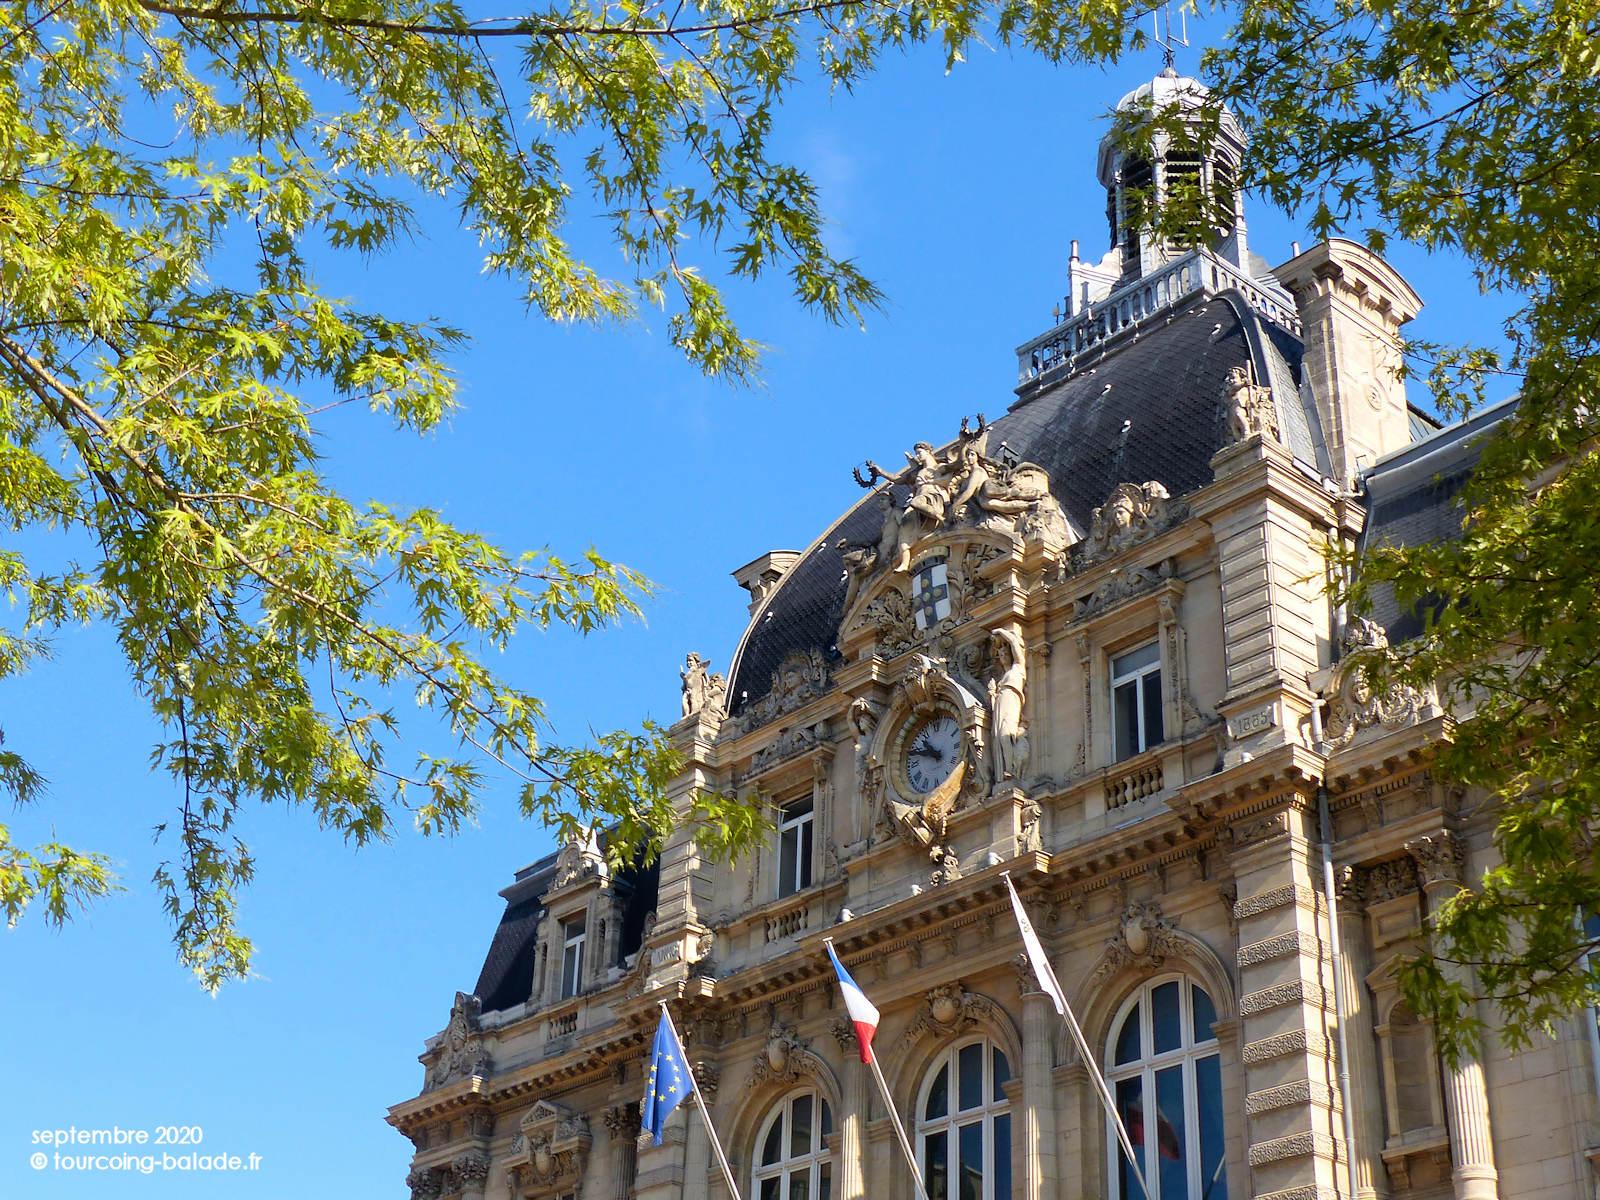 Façade de la Mairie de Tourcoing, Septembre 2020